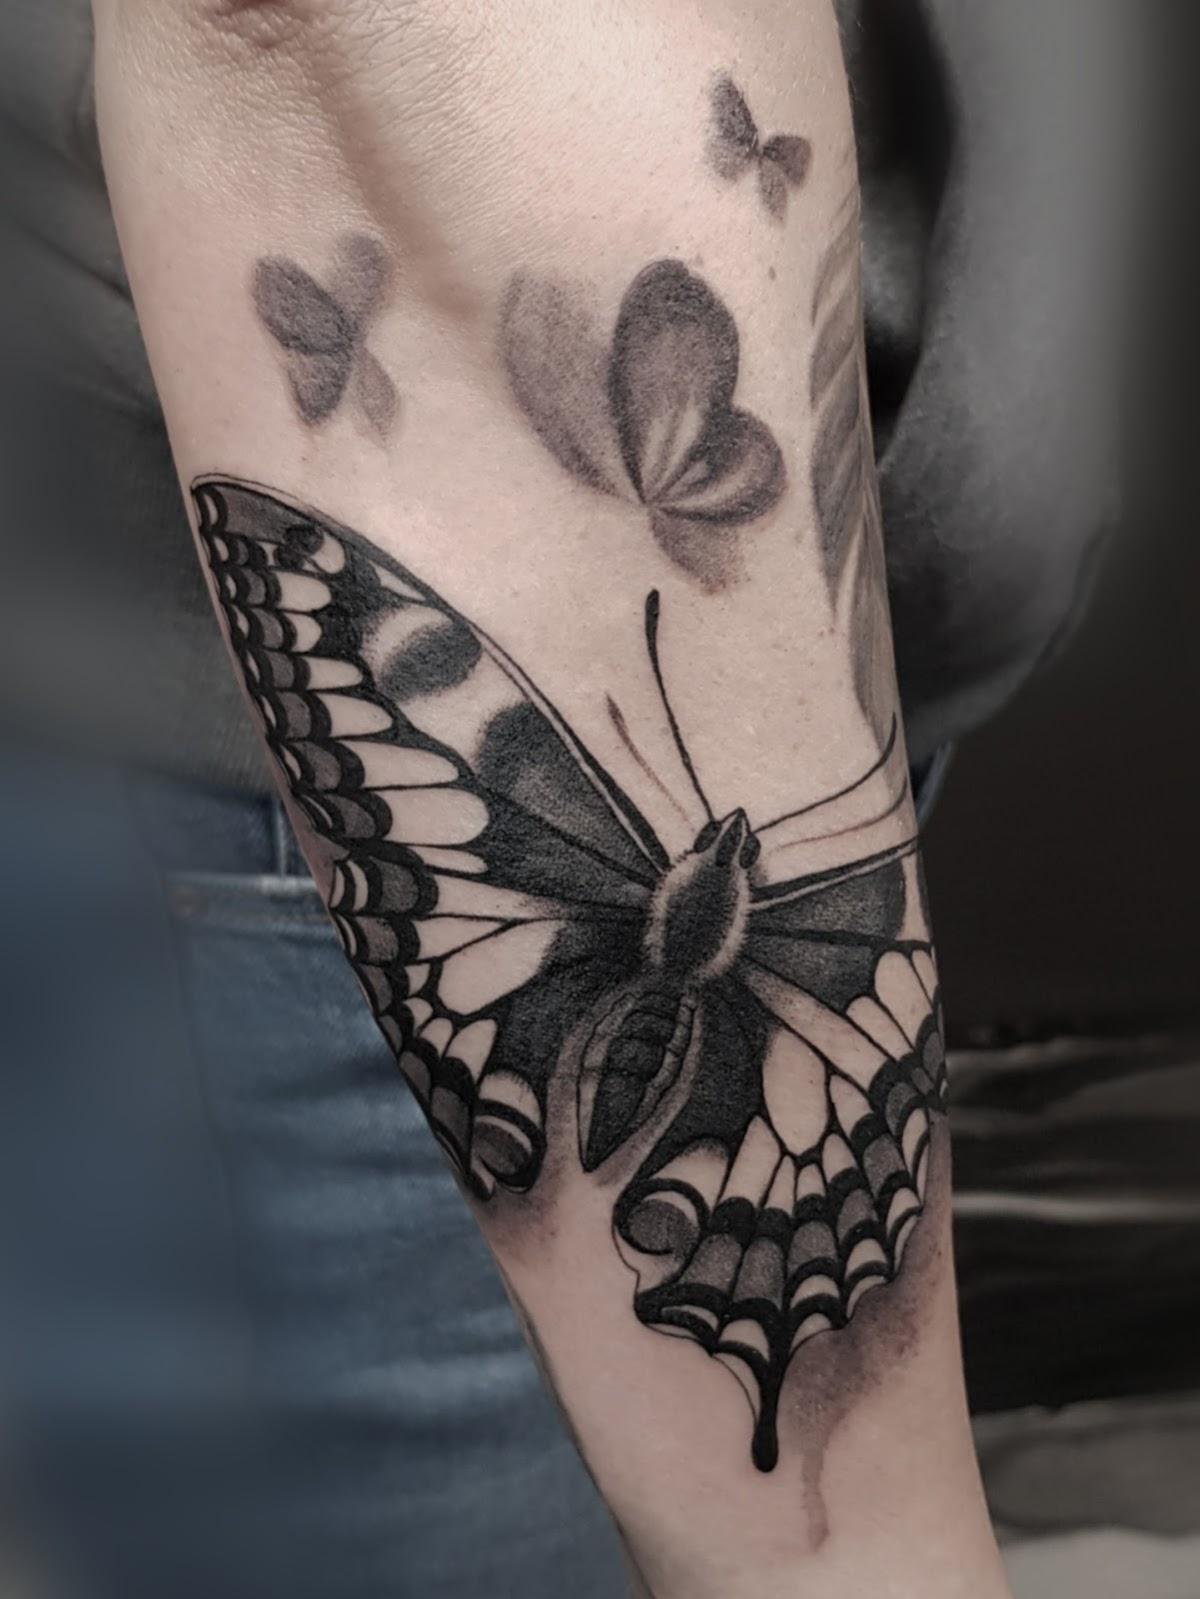 Tattoo-Schmmertelling